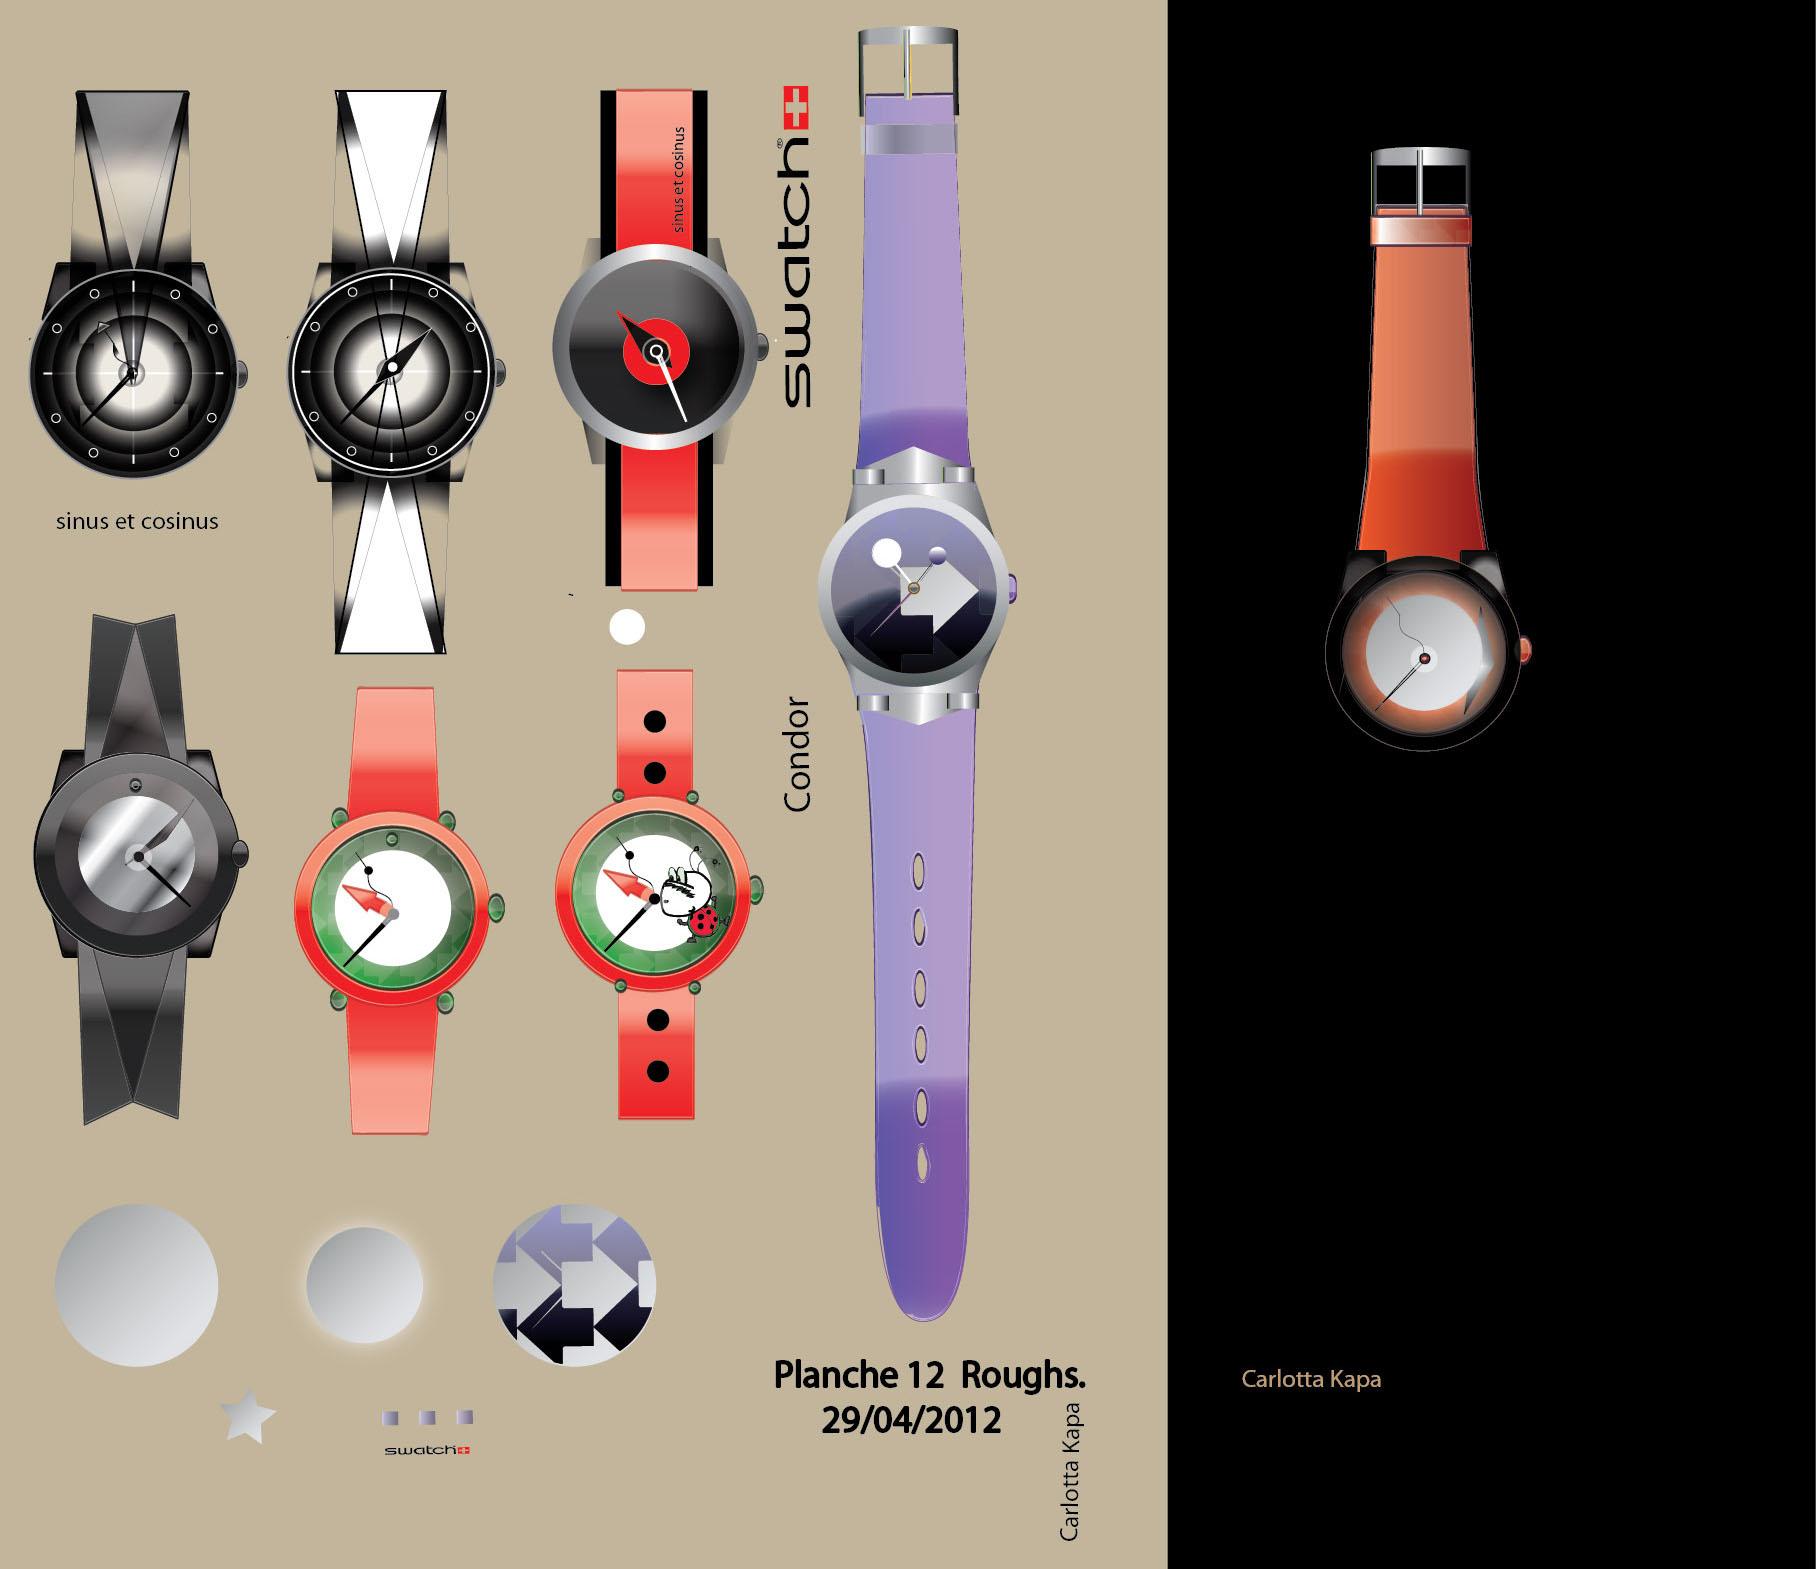 Swatch & Condor Planche 12 en cours bis (2)